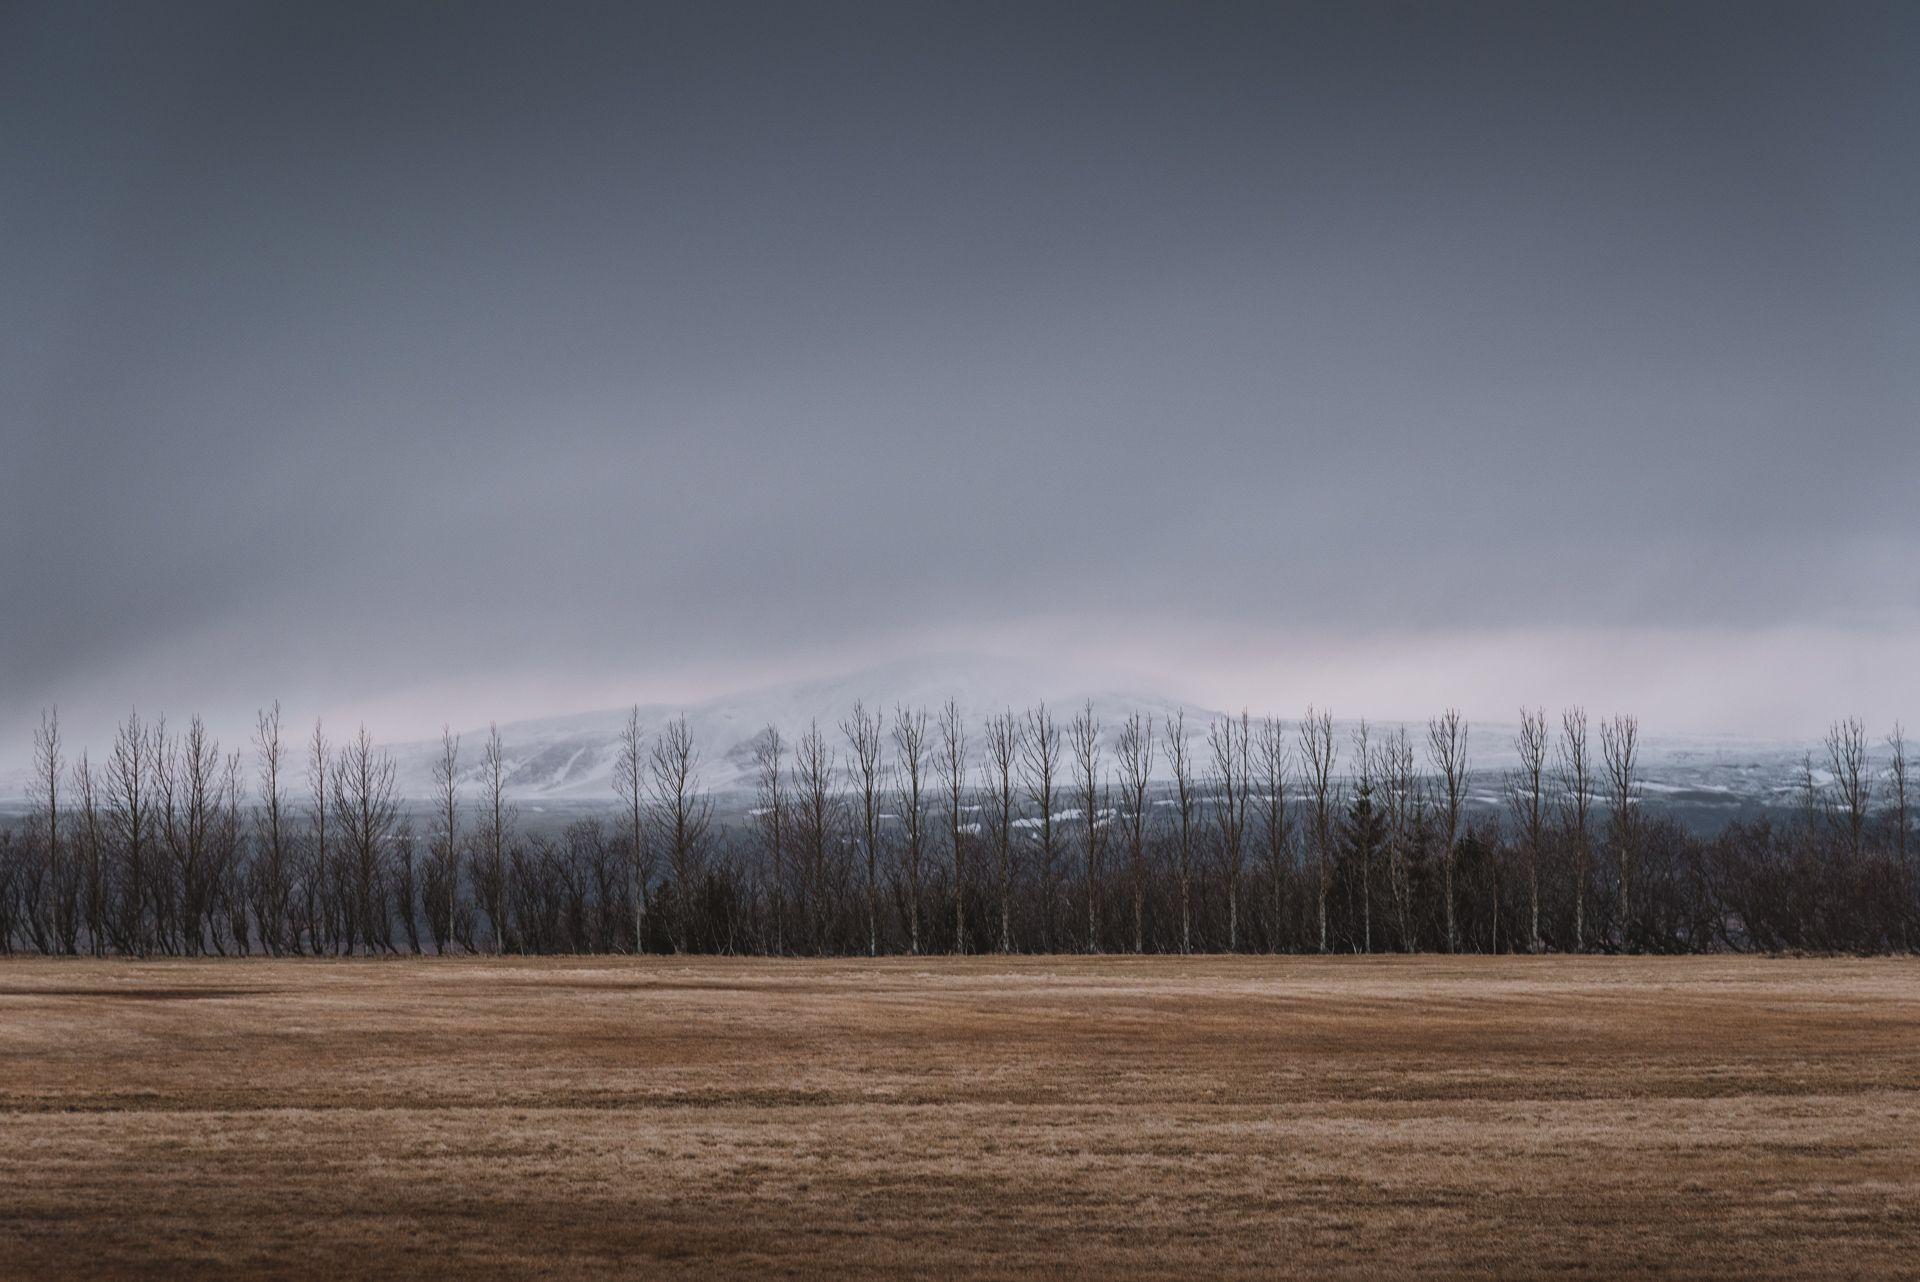 Moody Lightroom Presets For Landscape Photography